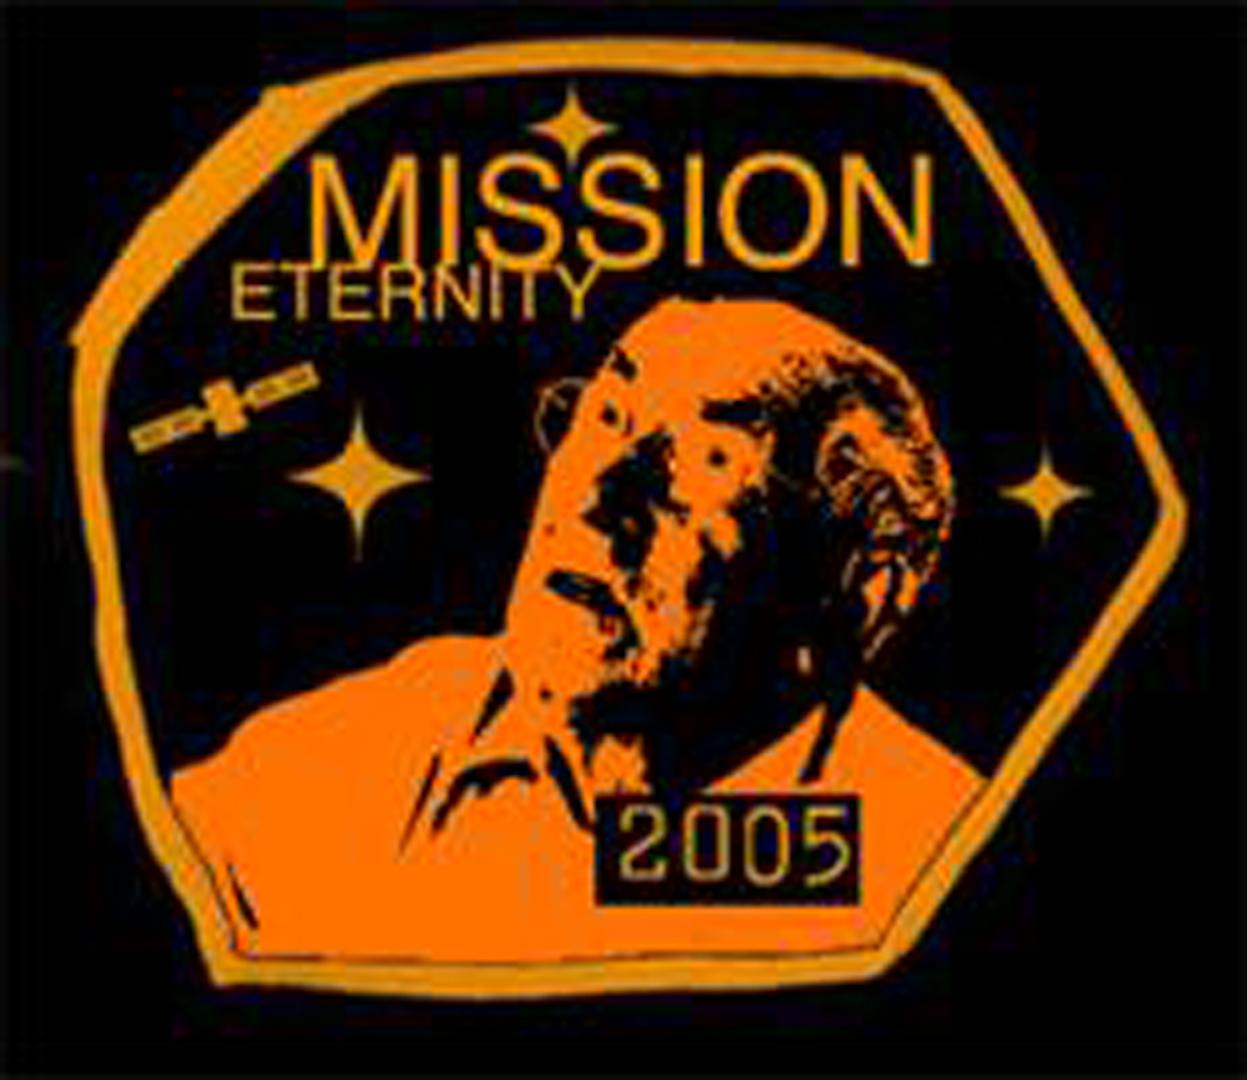 ©, etoy.CORPORATION, Mission Eternity